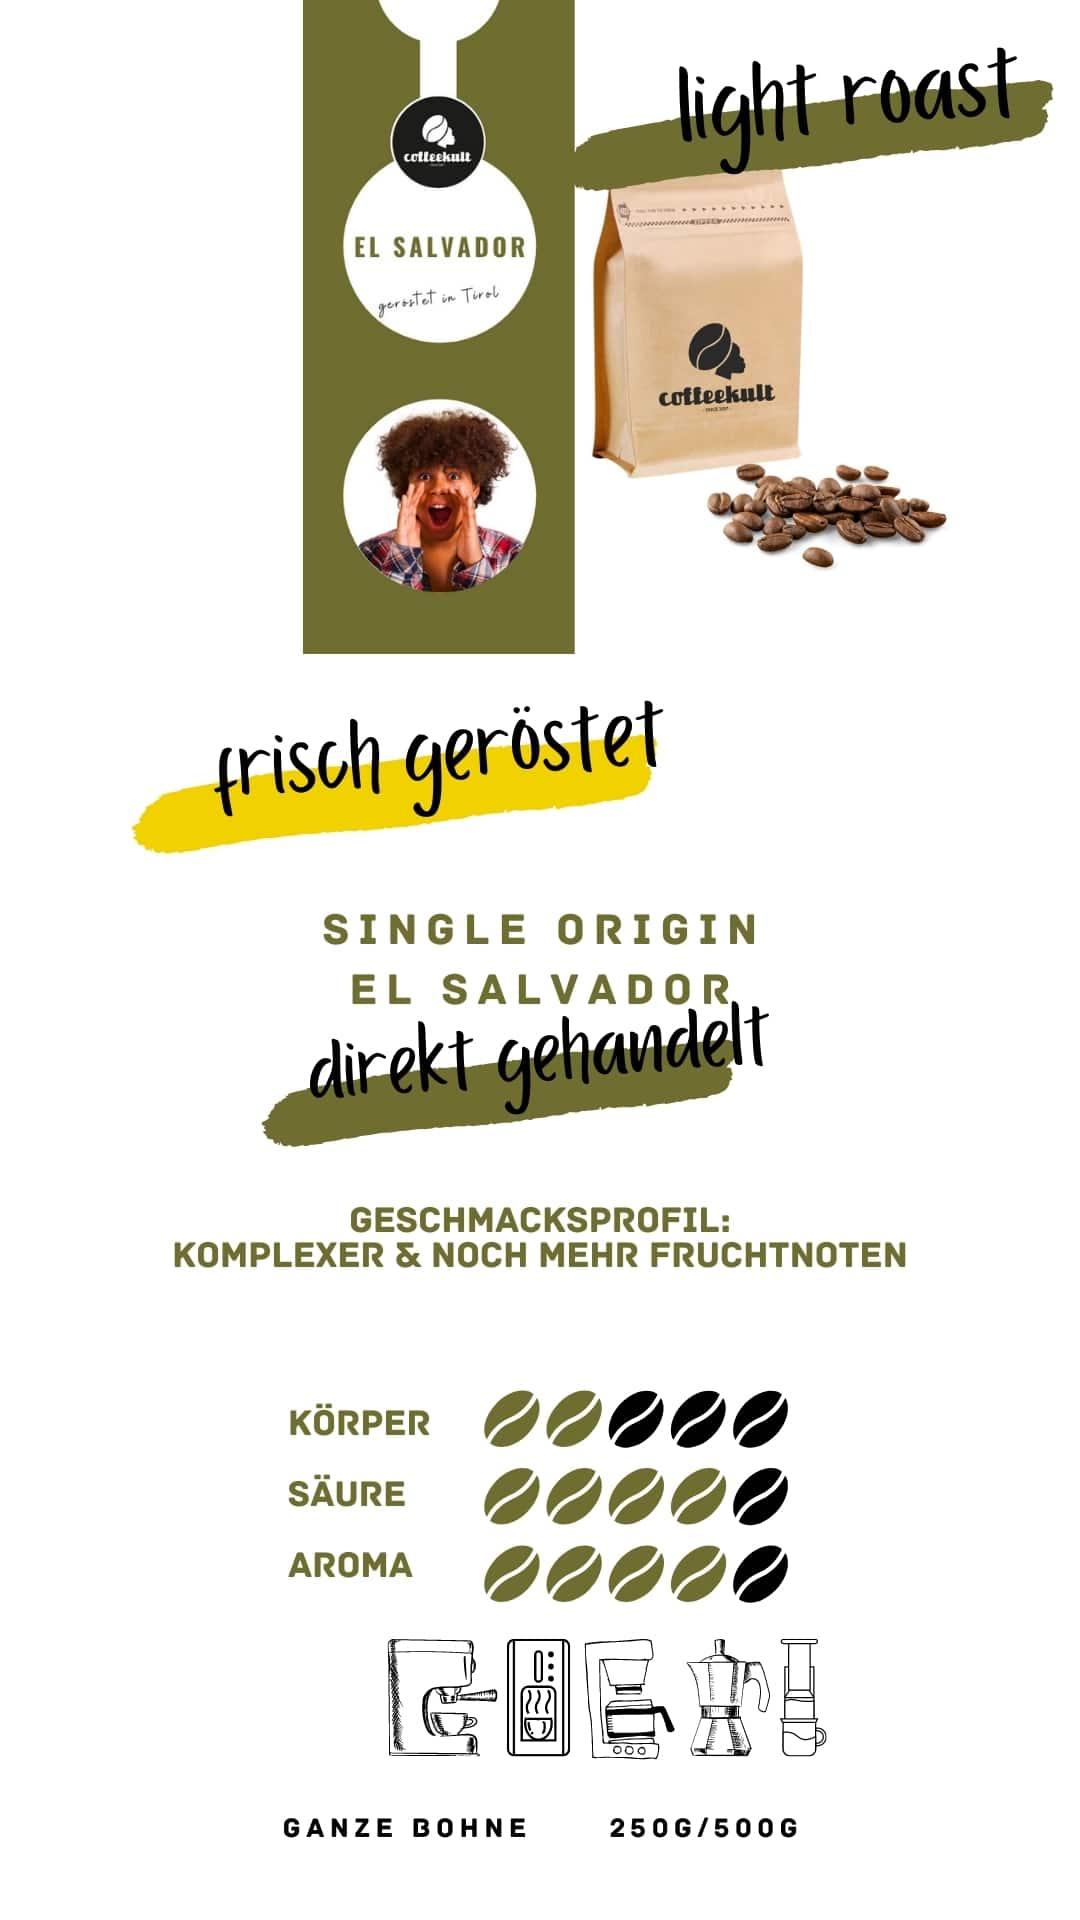 coffeekult coffee frisch geröstet barista kaffeerösterei innsbruck arabica bohnen el salvador light roast